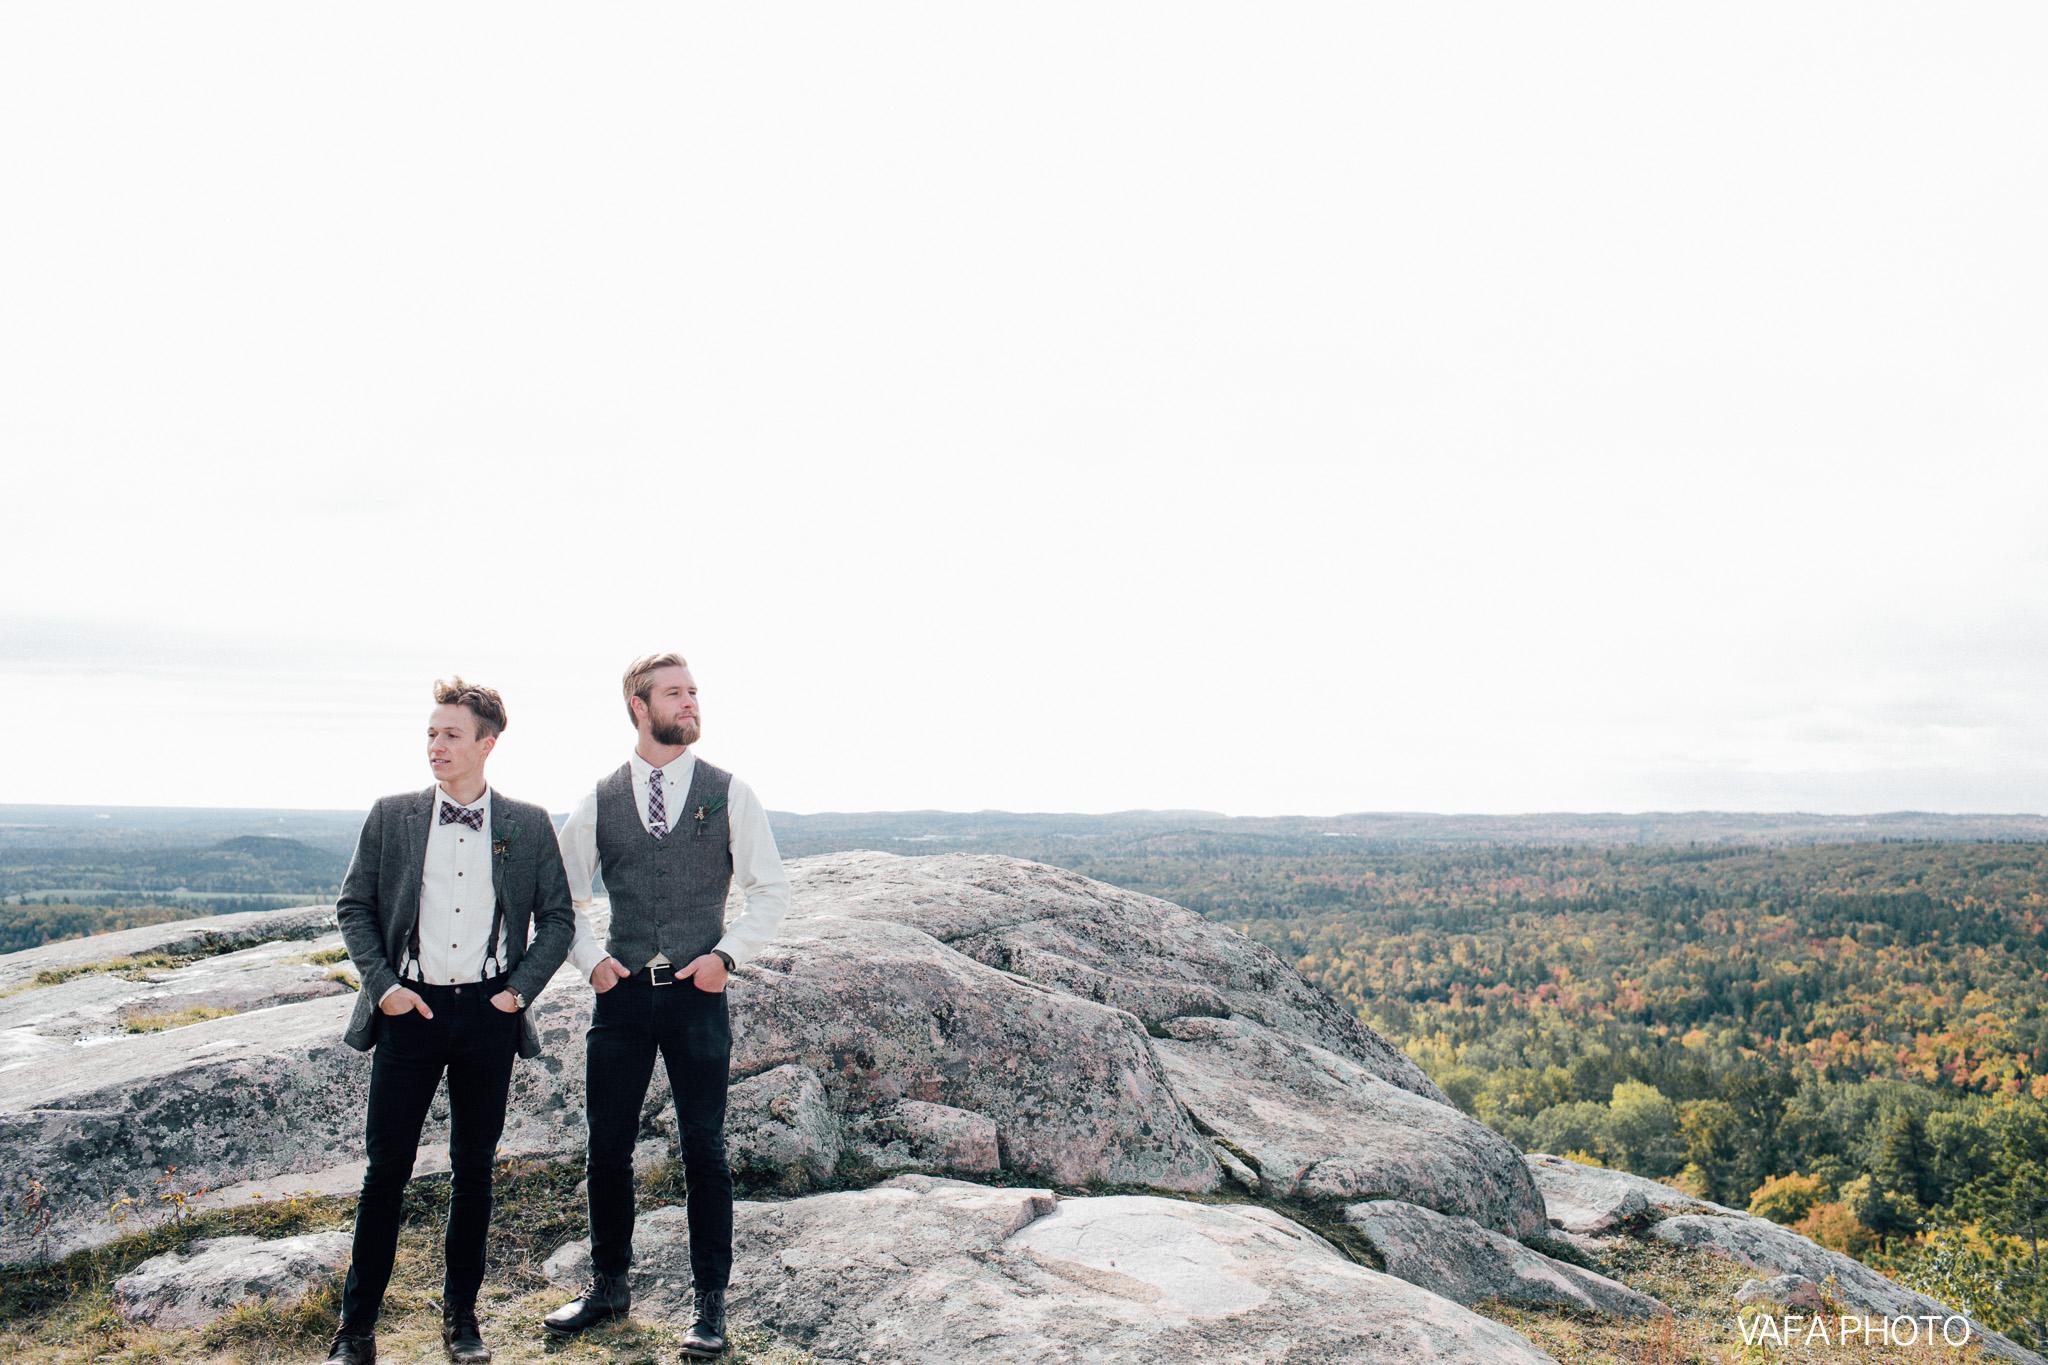 Hogback-Mountain-Wedding-Chelsea-Josh-Vafa-Photo-335.jpg